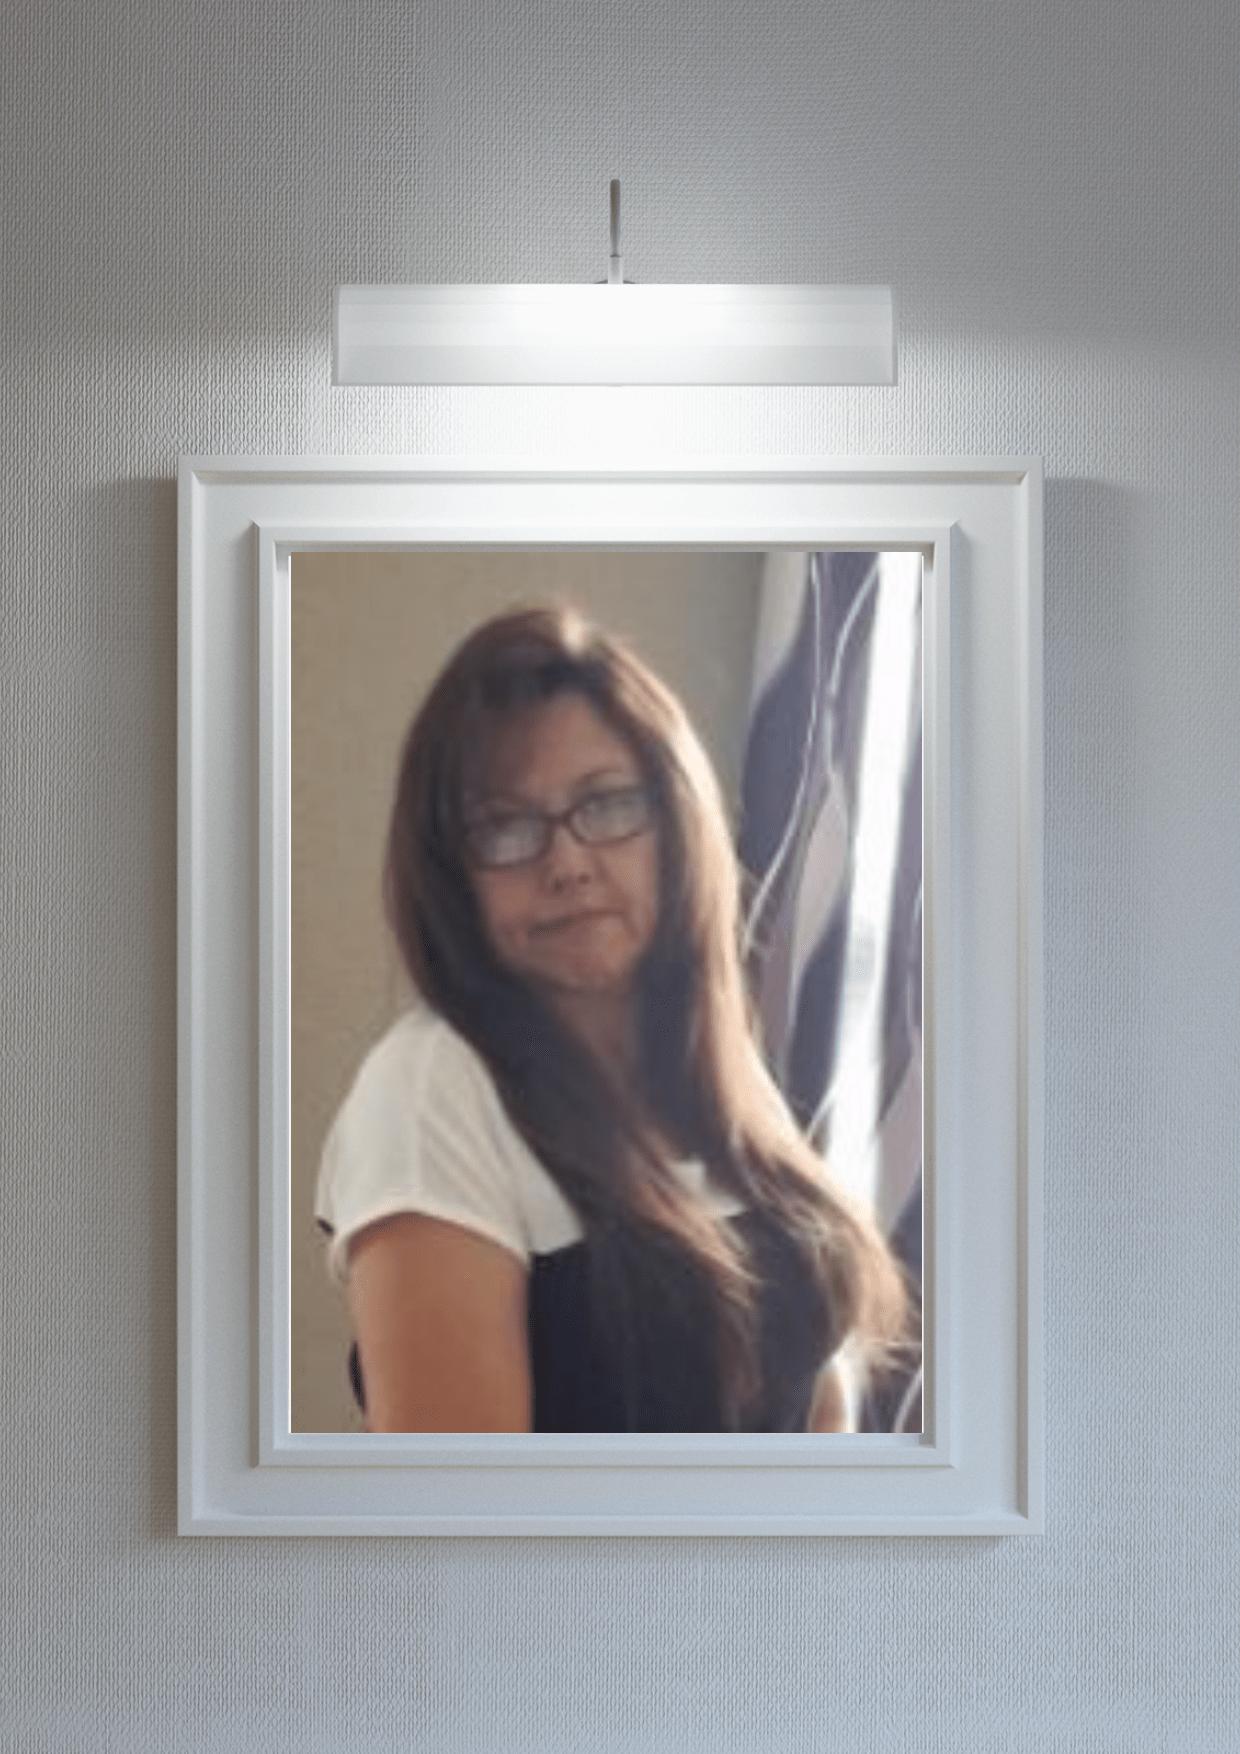 Photograph,                Picture,                Frame,                Mirror,                Window,                Lamp,                Interior,                Design,                Shelf,                Portrait,                Girl,                Mockup,                Inspiration,                 Free Image